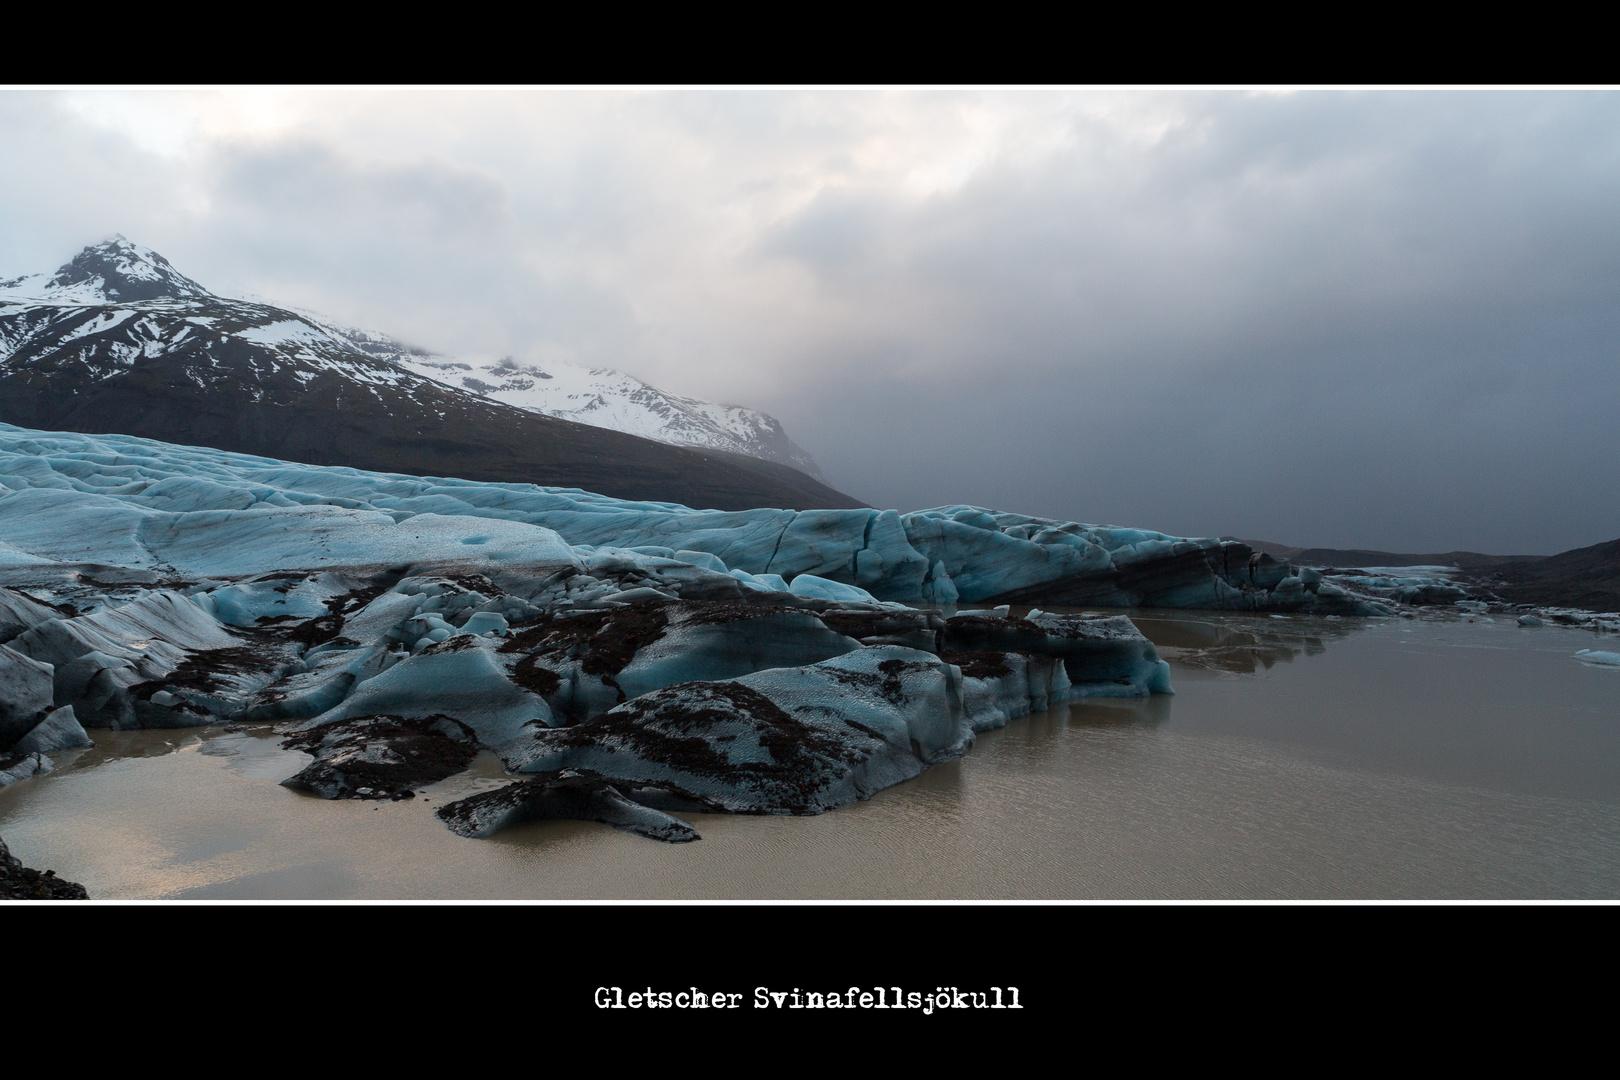 Gletscher Svinafellsjökull 2